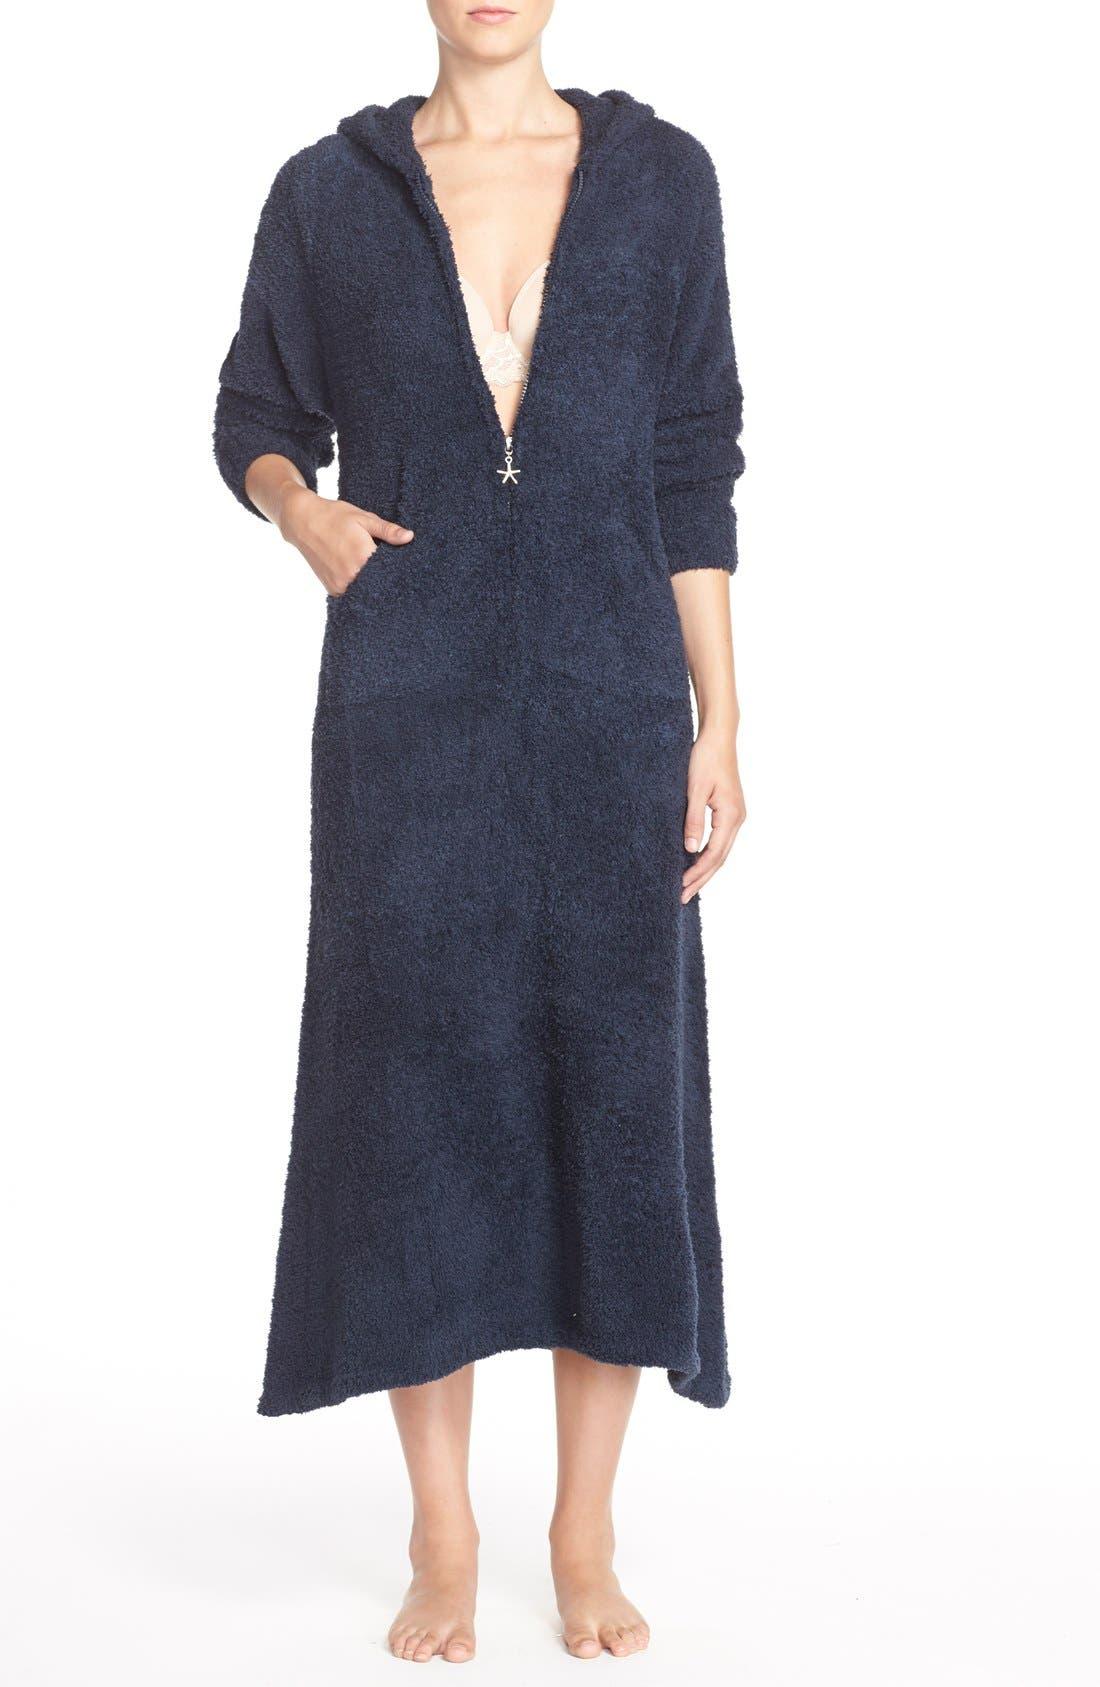 Alternate Image 1 Selected - Barefoot Dreams® CozyChic® Hooded Zip Robe